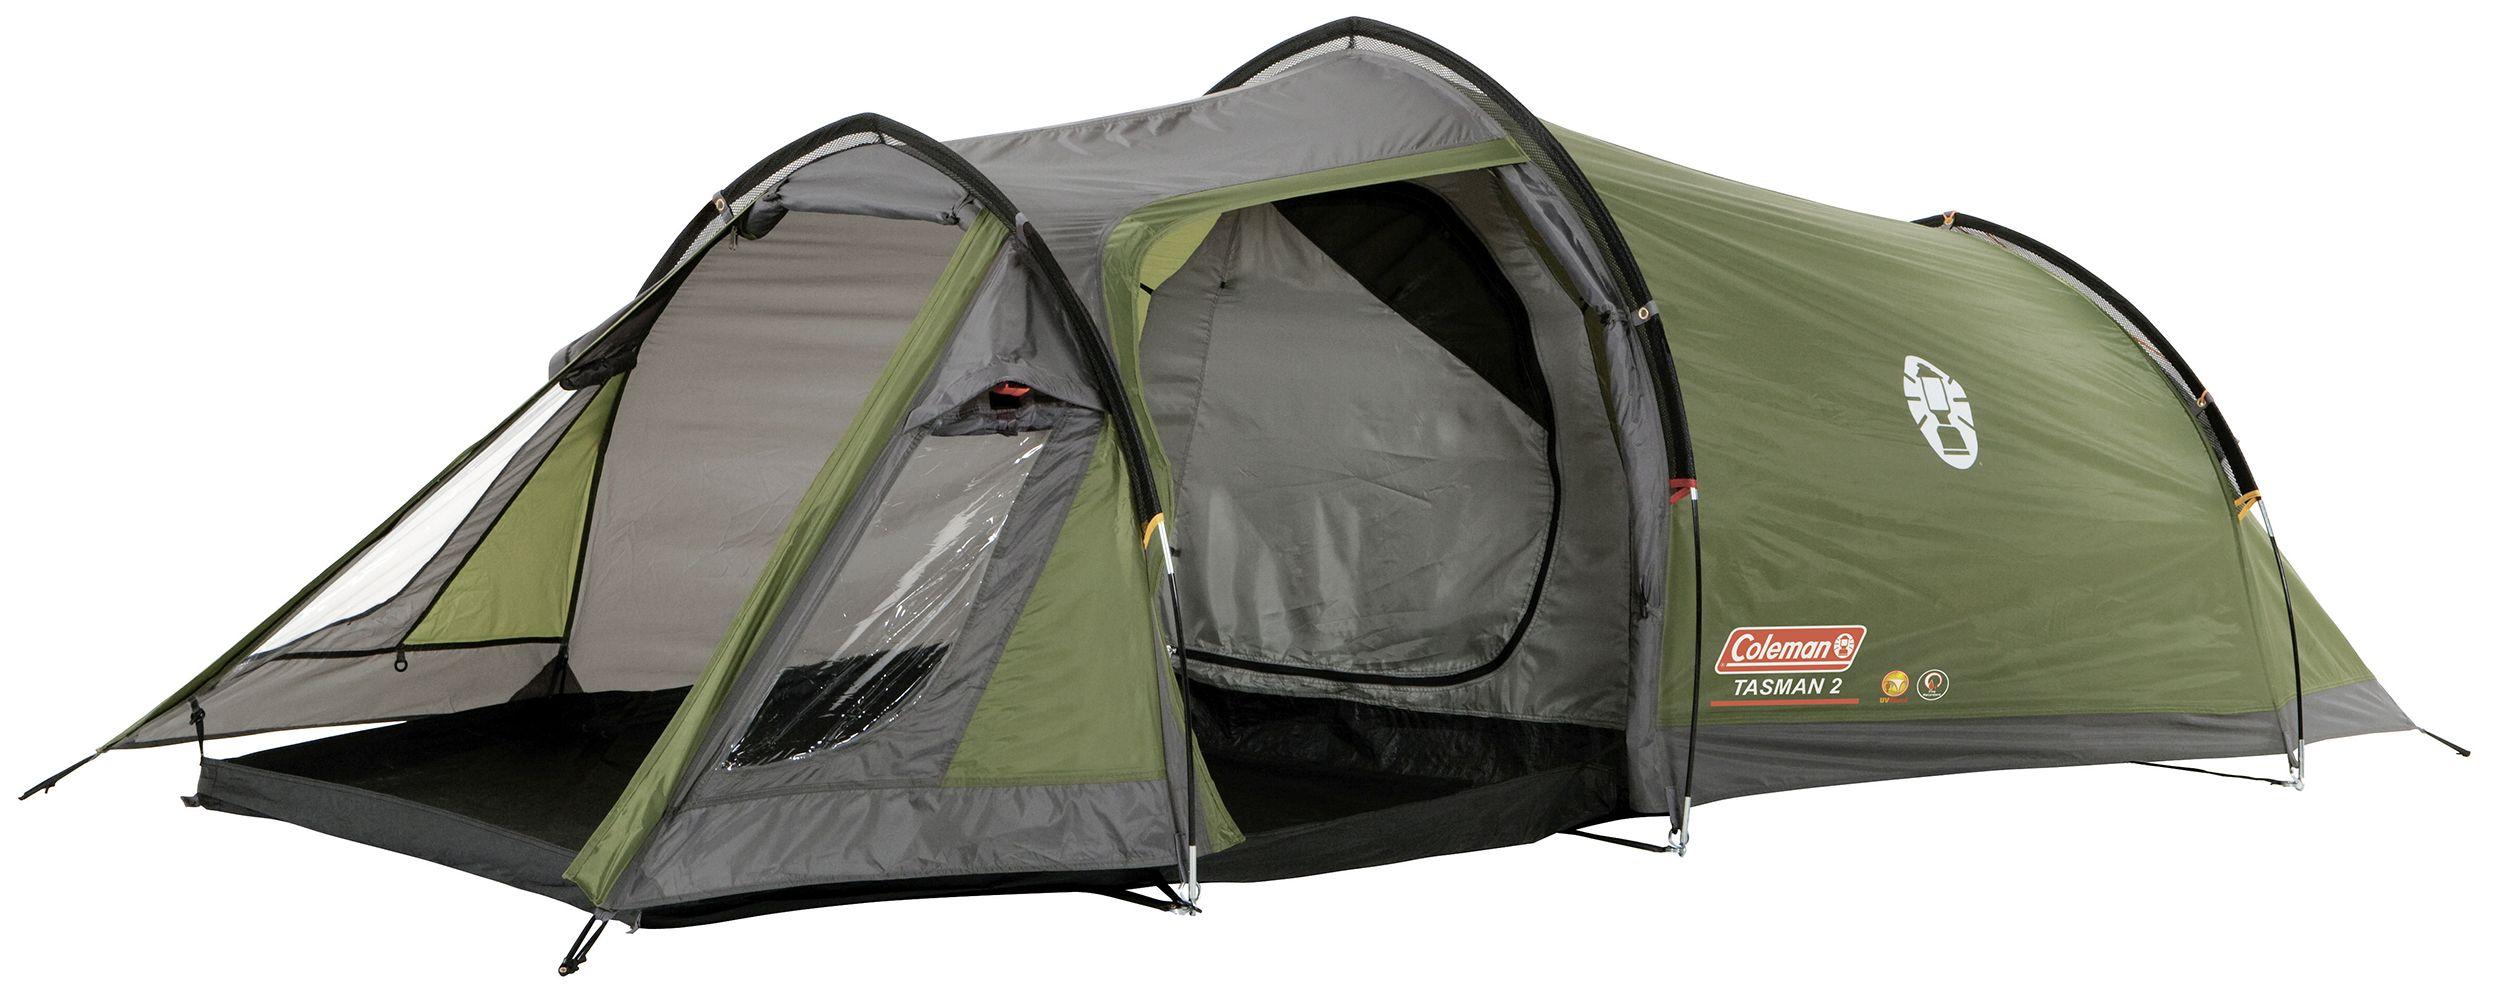 Coleman Tasman 2 Man Camping Tunnel Tent, Tents, camping tents ...